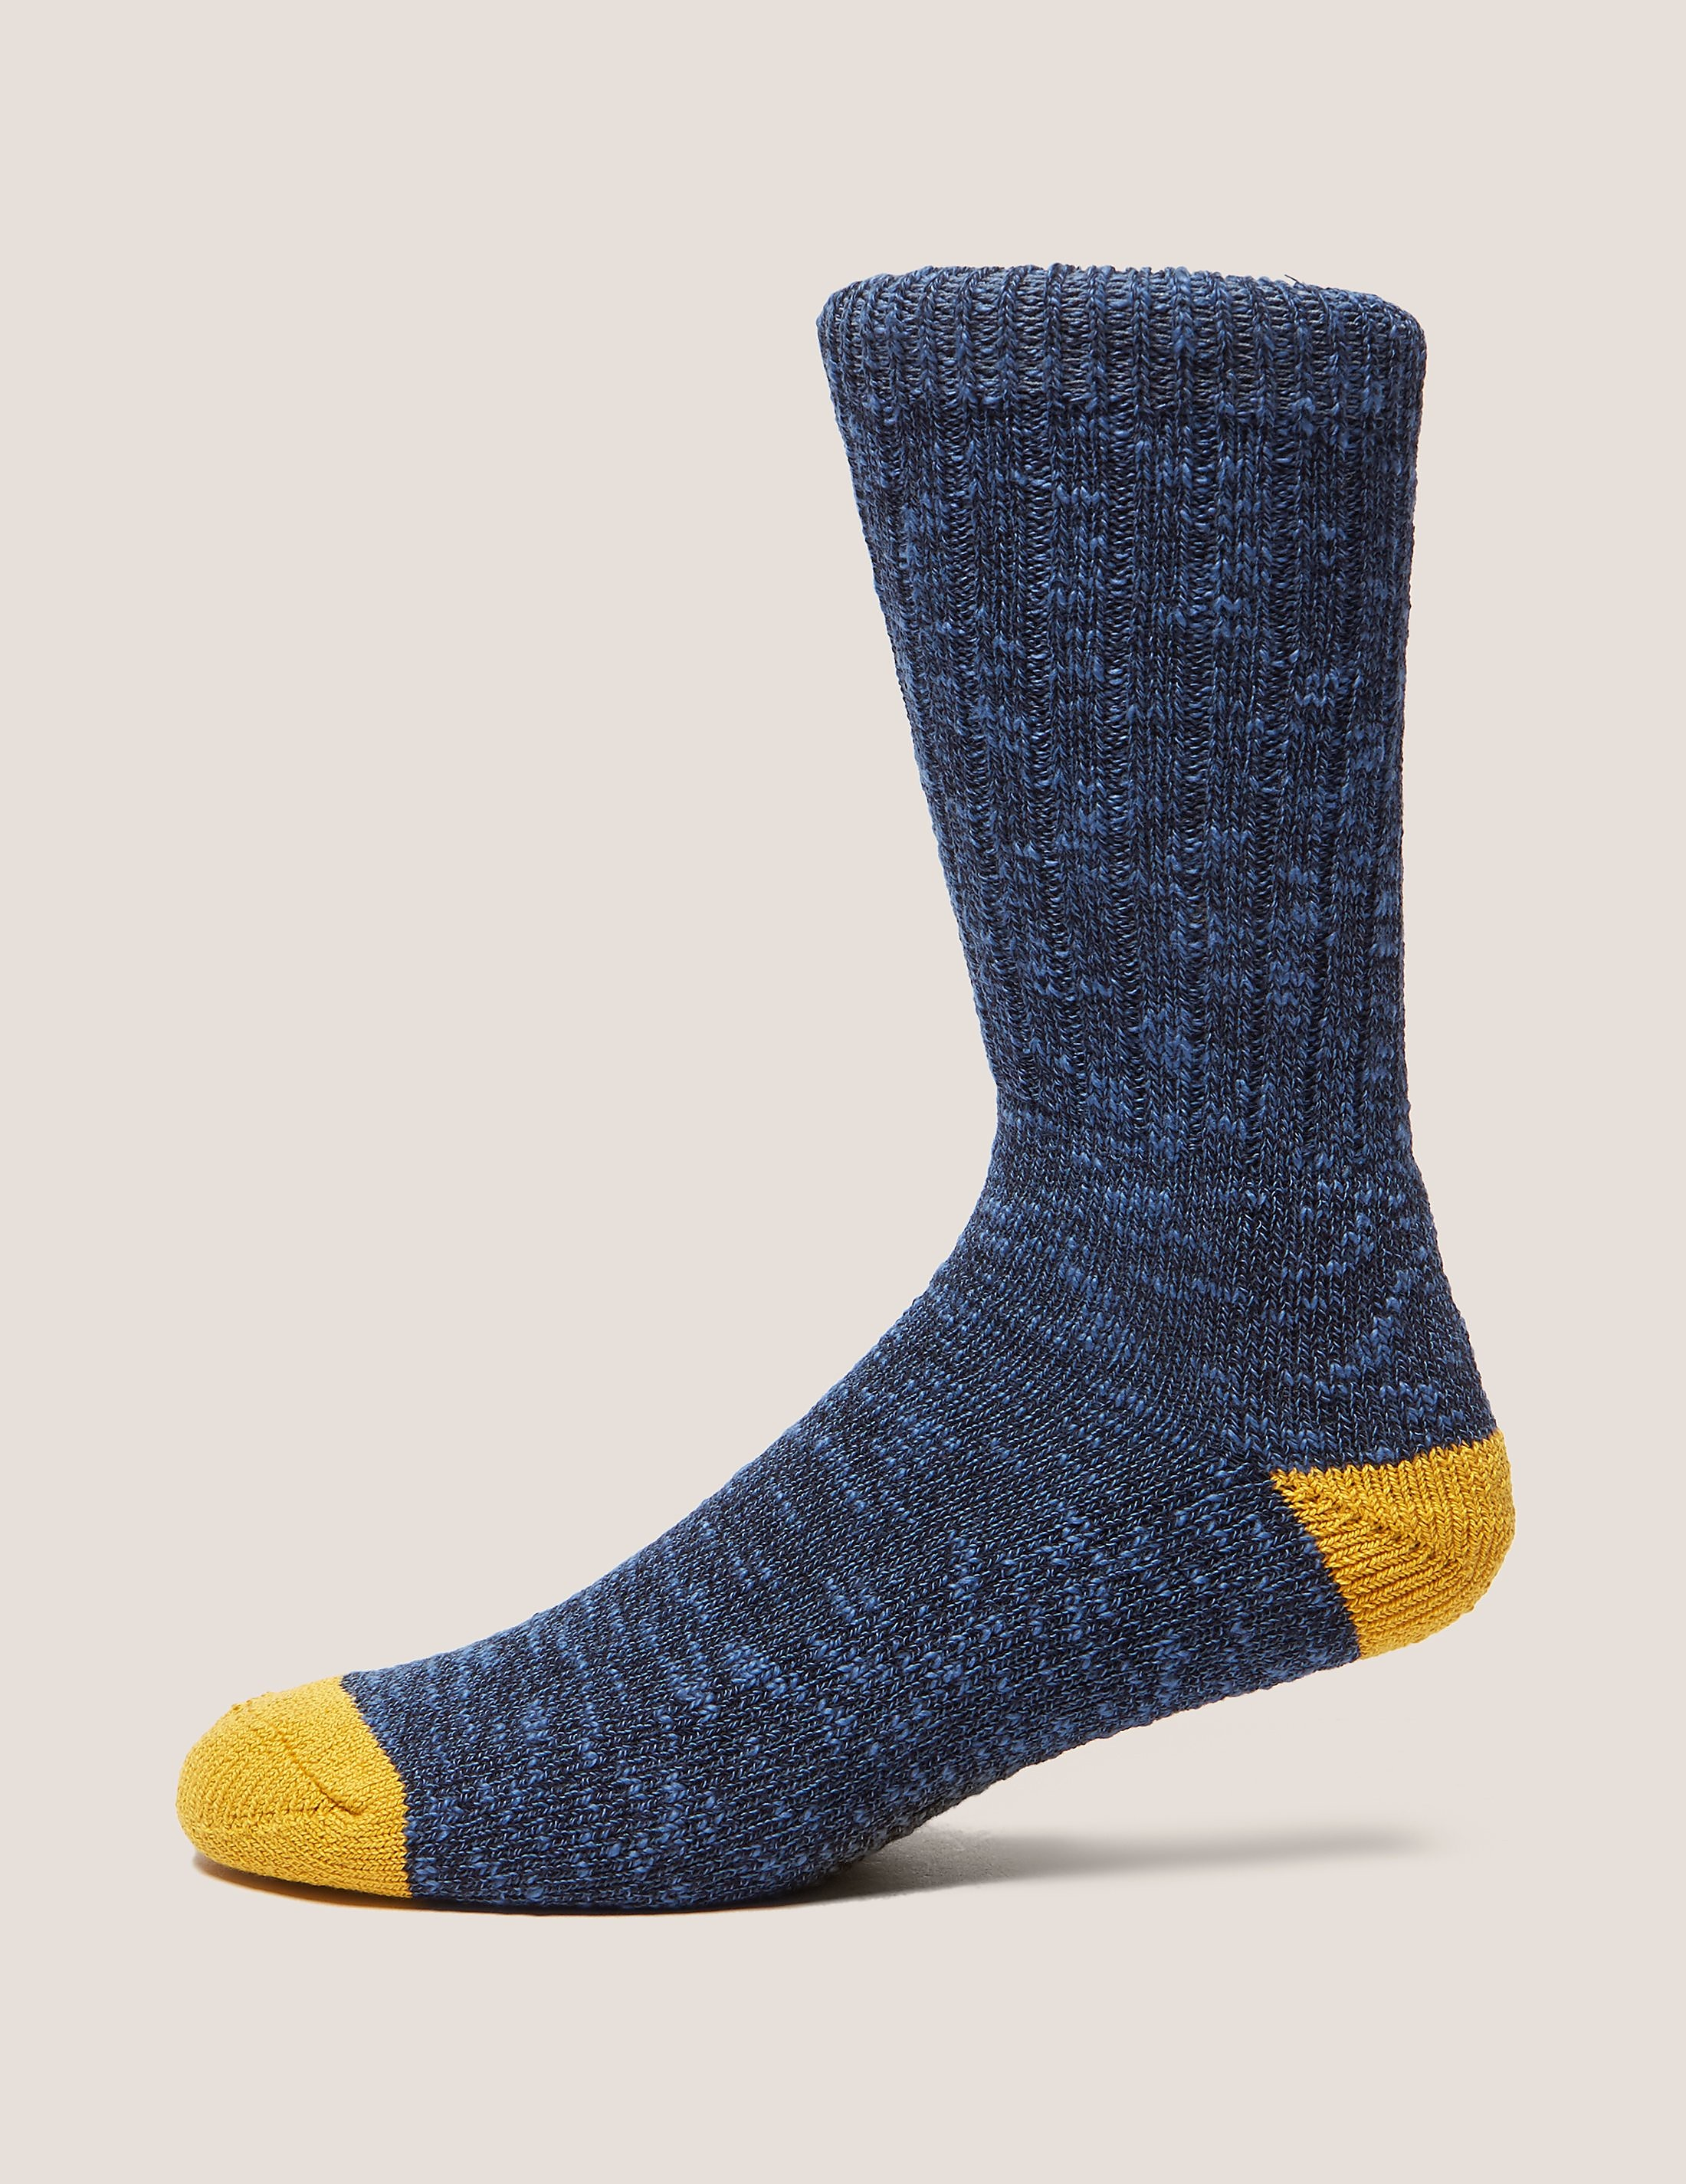 Barbour Mariner Socks